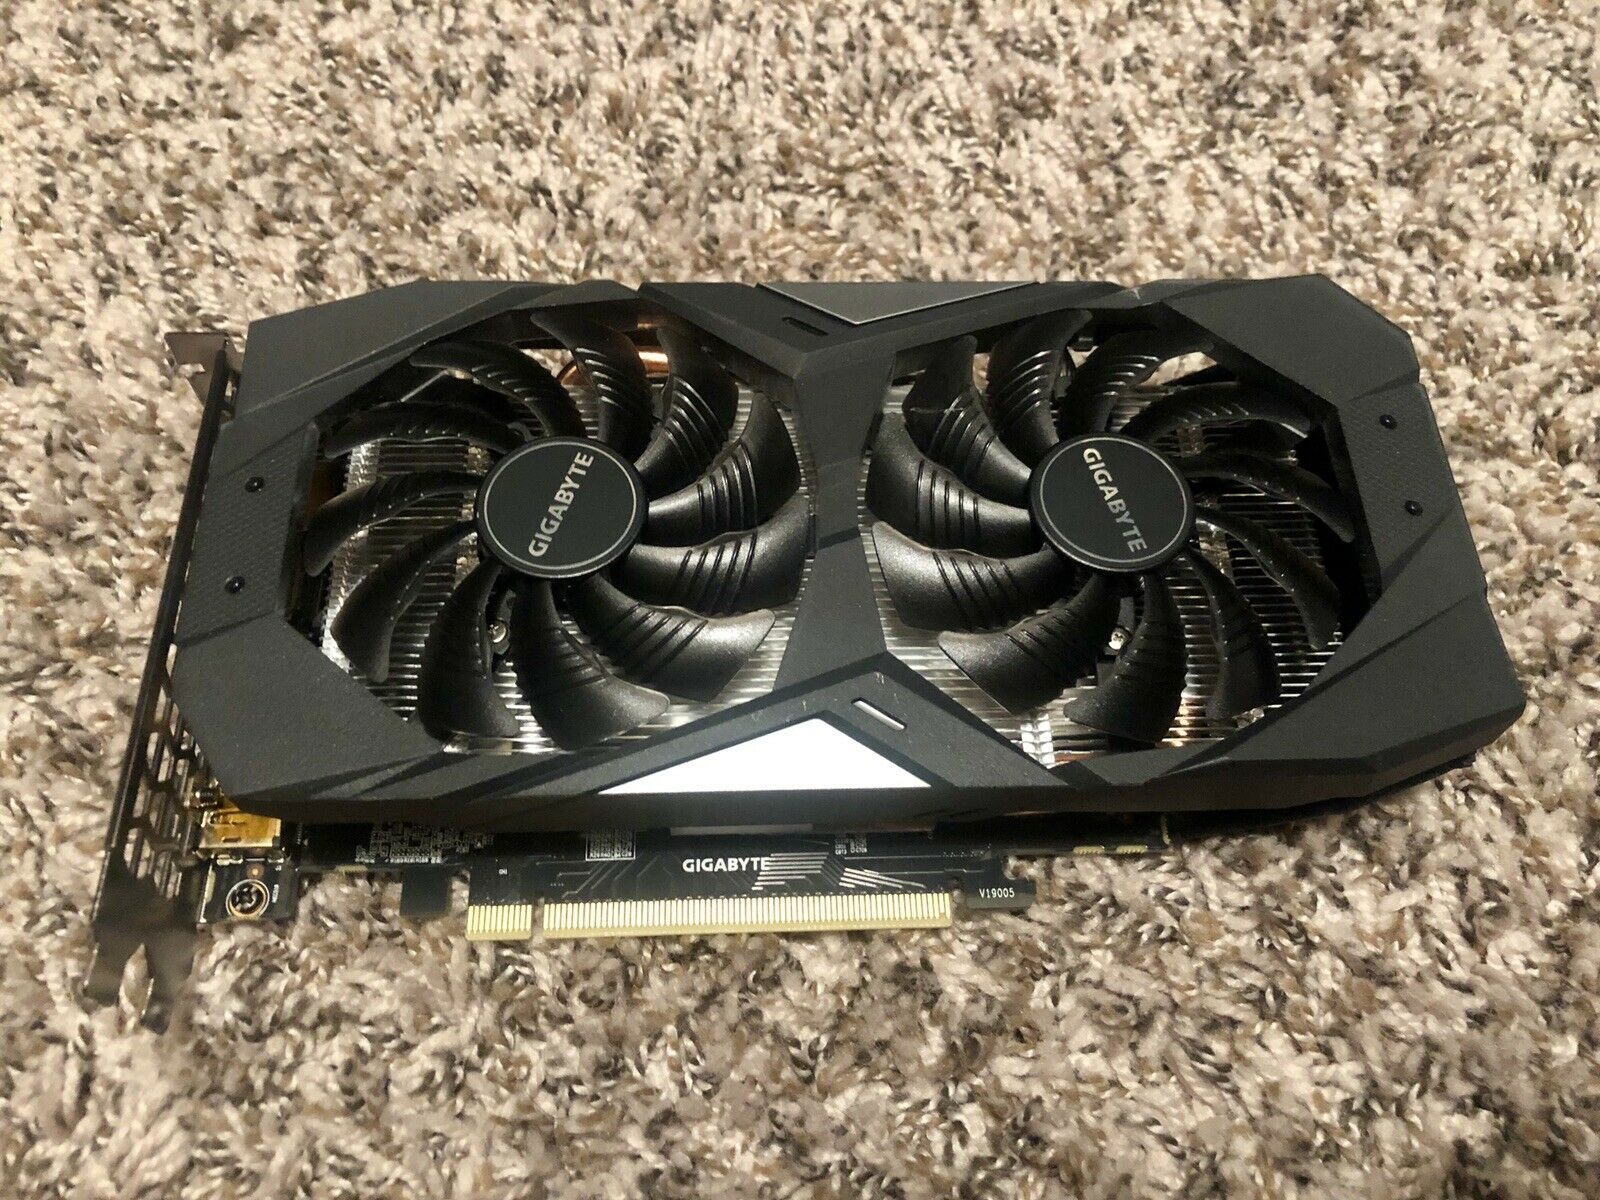 Gigabyte Geforce GTX 1660 OC 6G Graphics Card